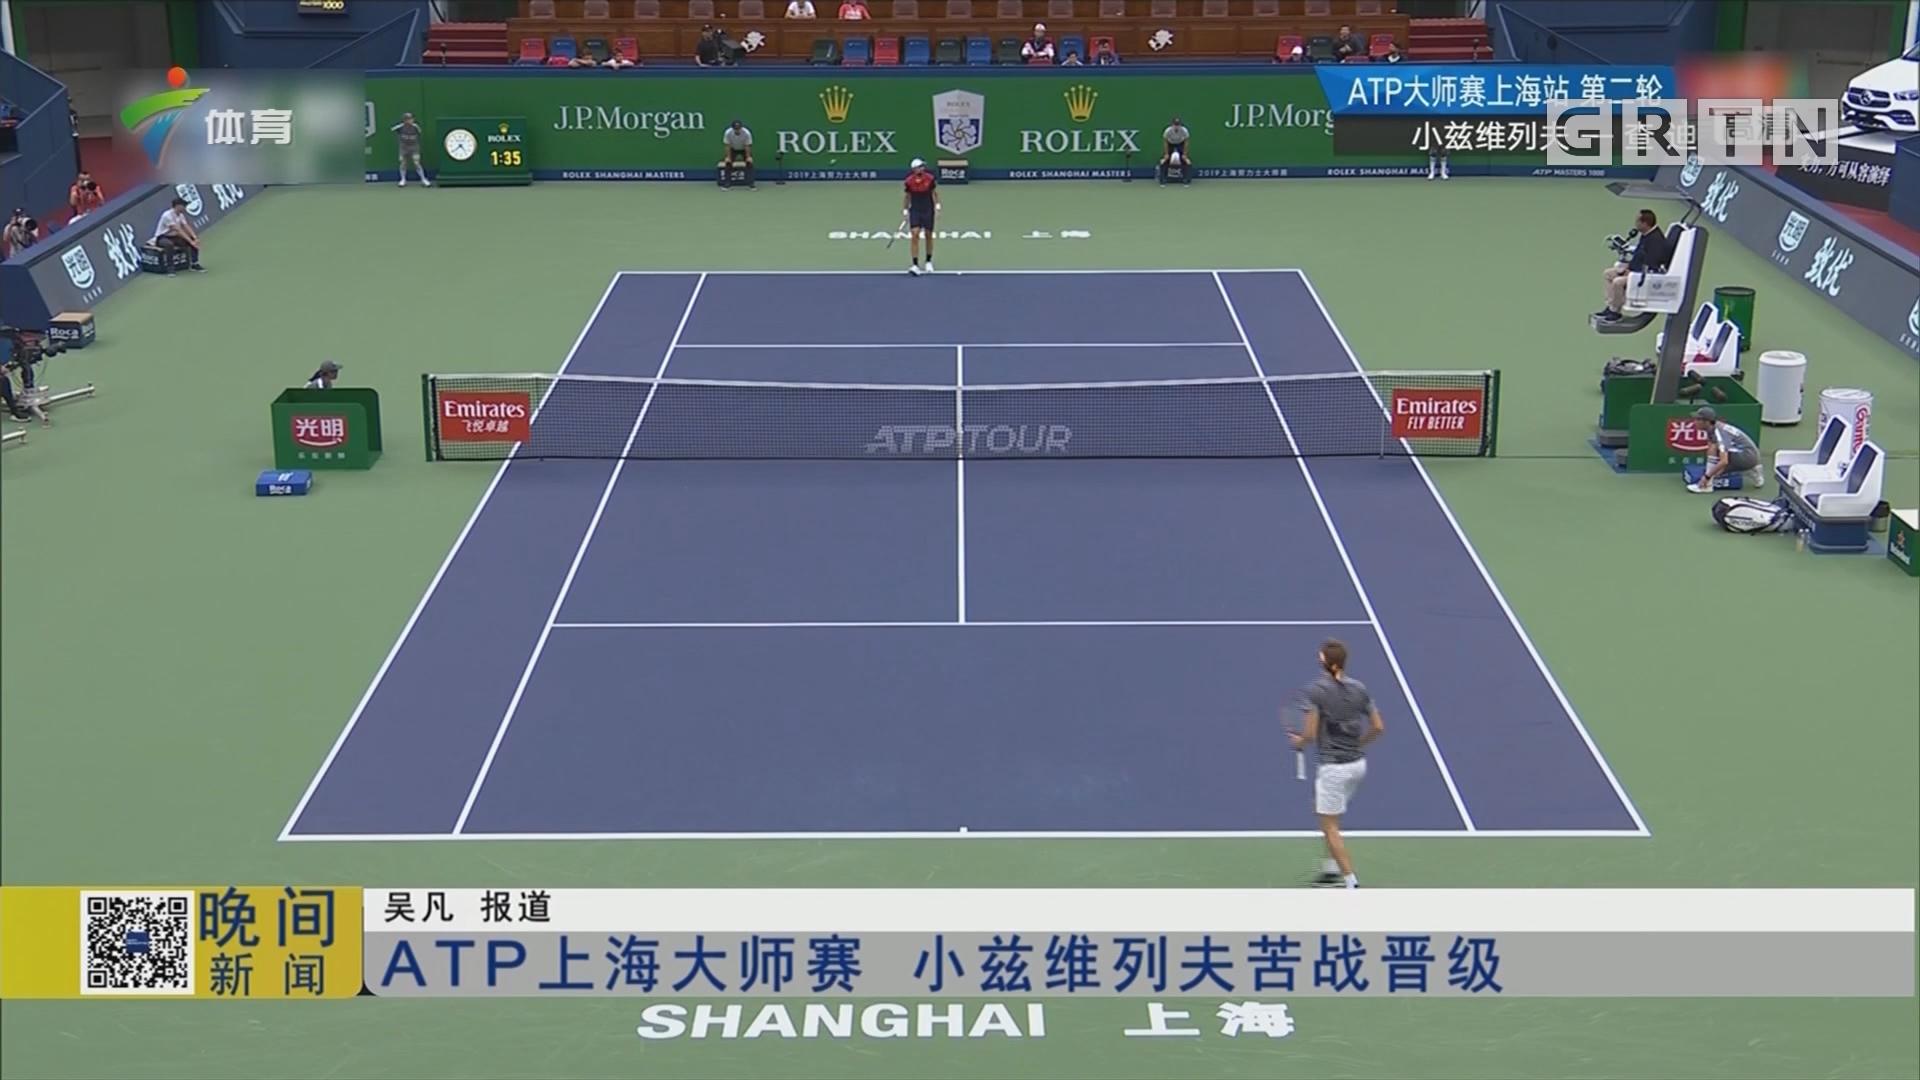 ATP上海大师赛 小兹维列夫苦战晋级